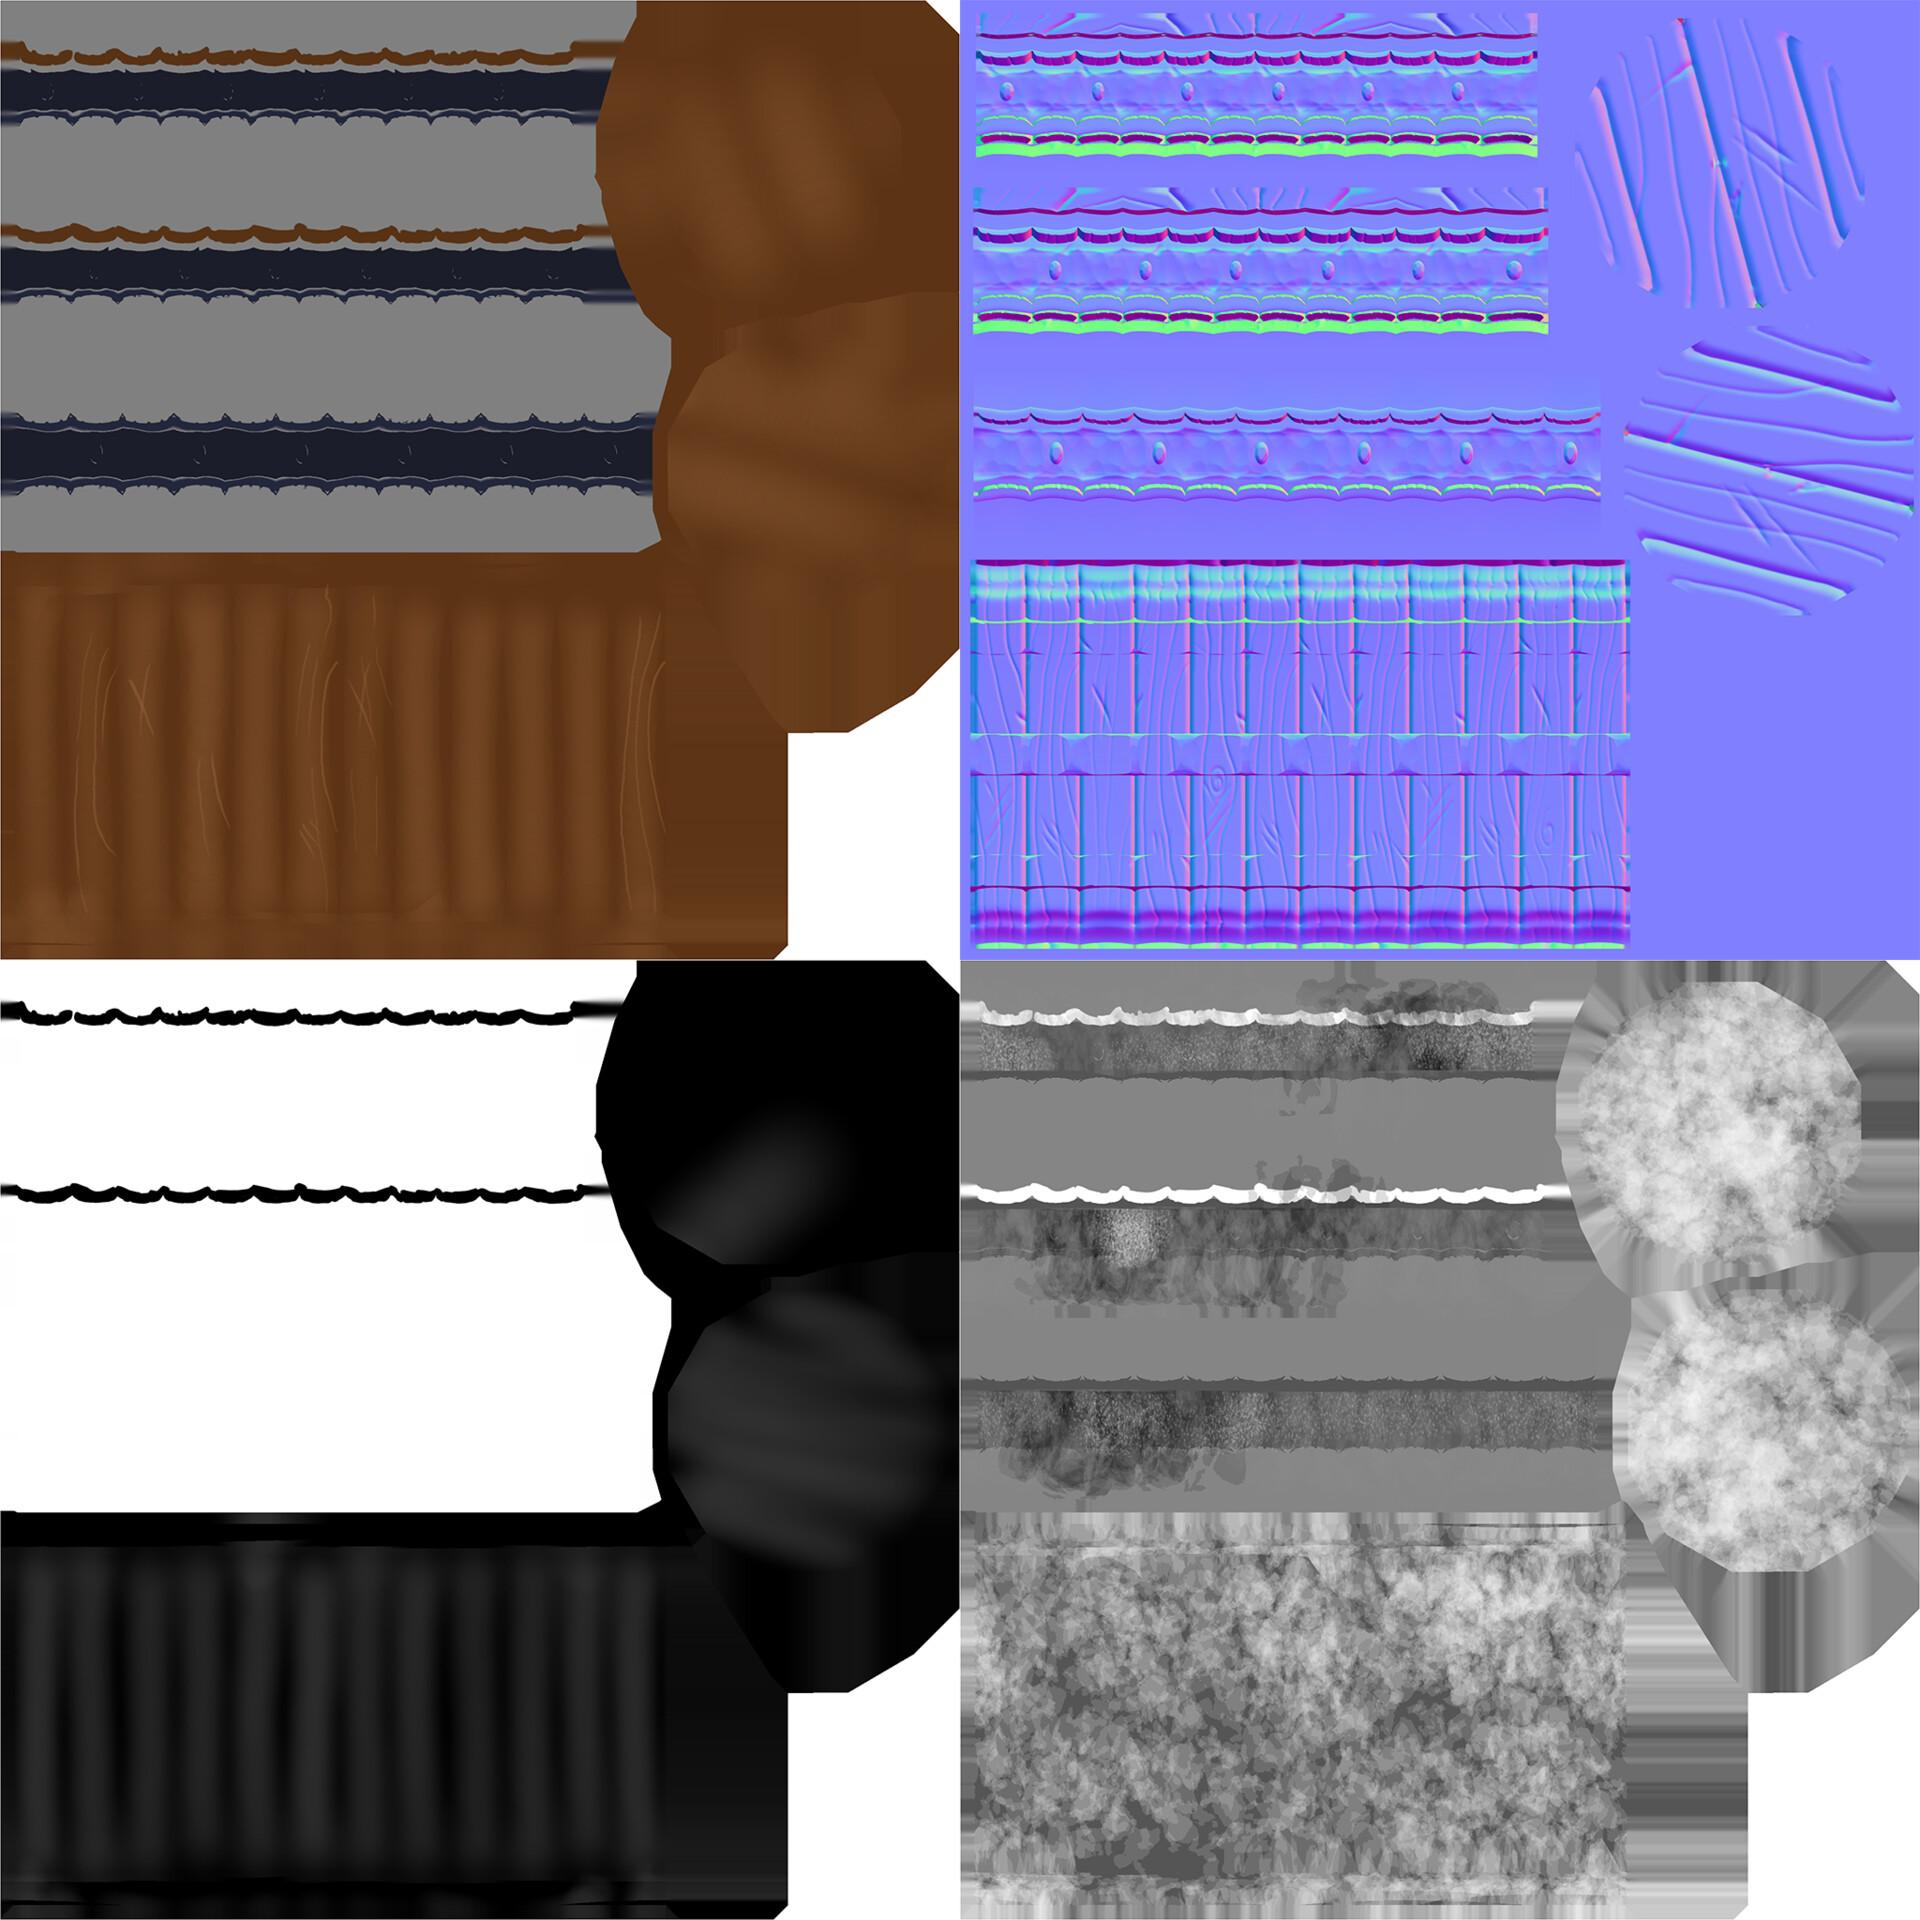 Judie thai barrel textures